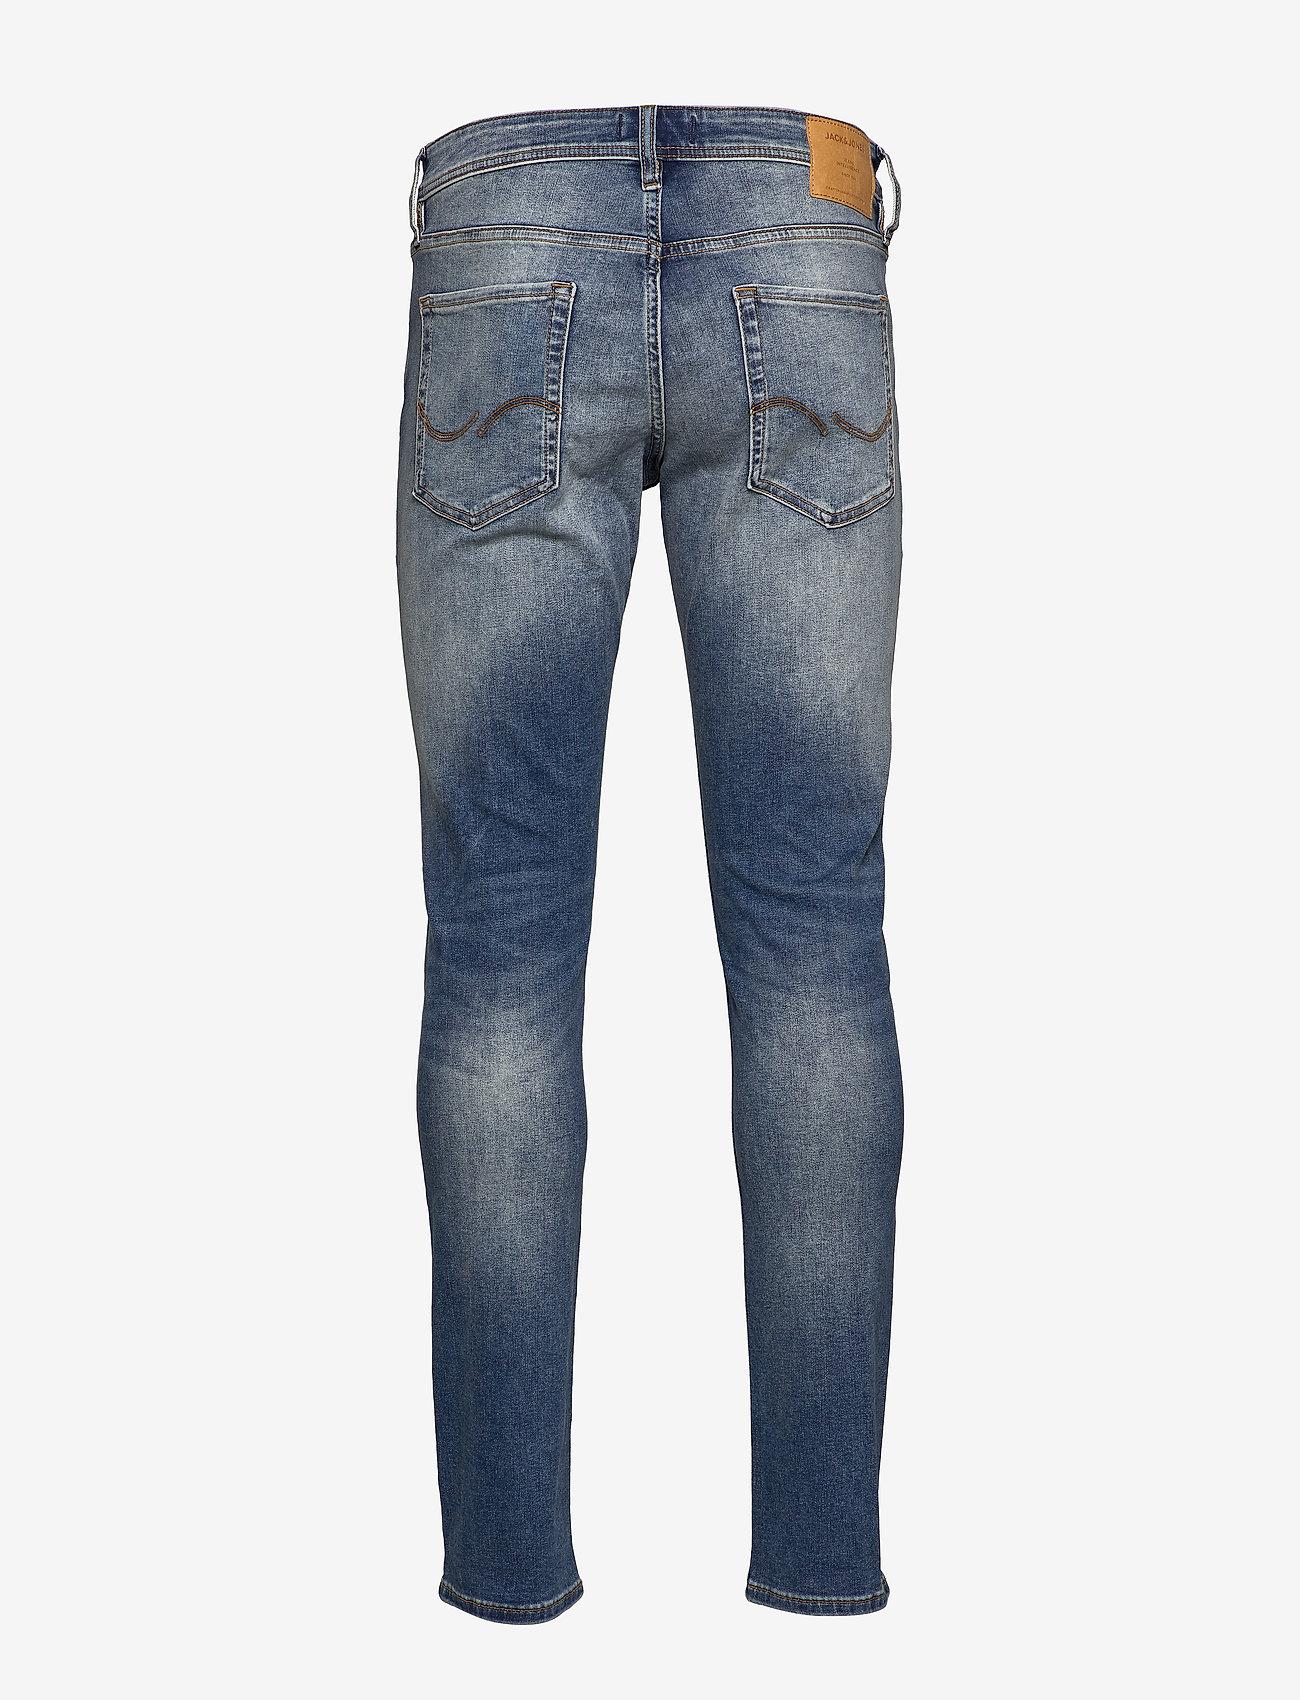 Jack & Jones - JJIGLENN JJORIGINAL GE 050 50SPS NOOS - slim jeans - blue denim - 1